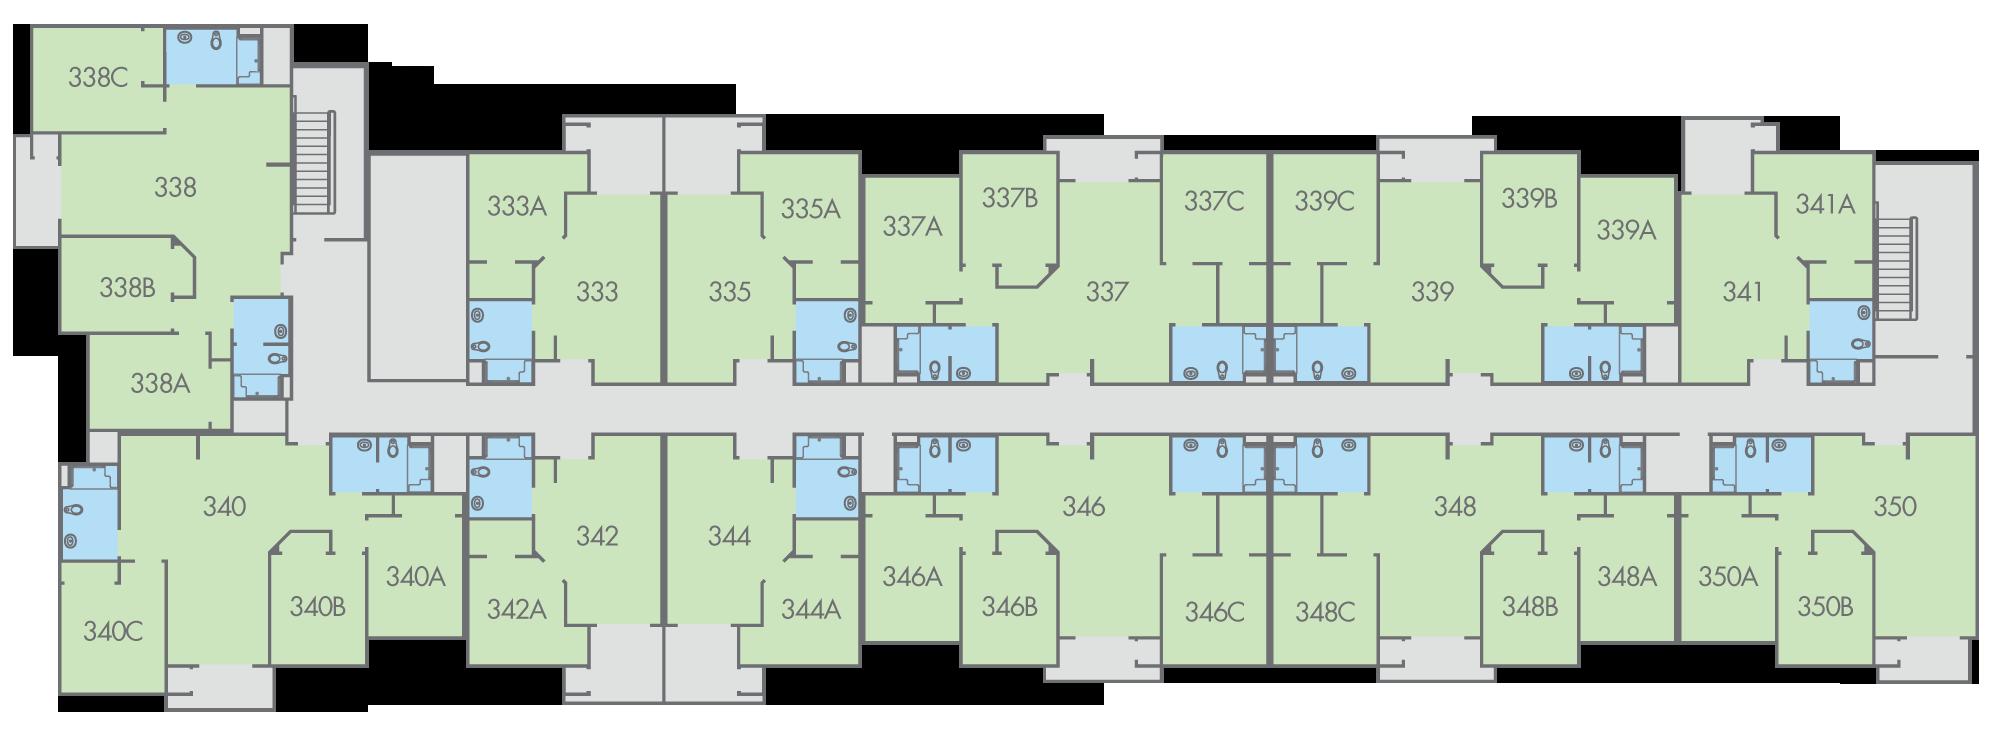 Floor Plan Primero Grove Magnolia Building Third Floor